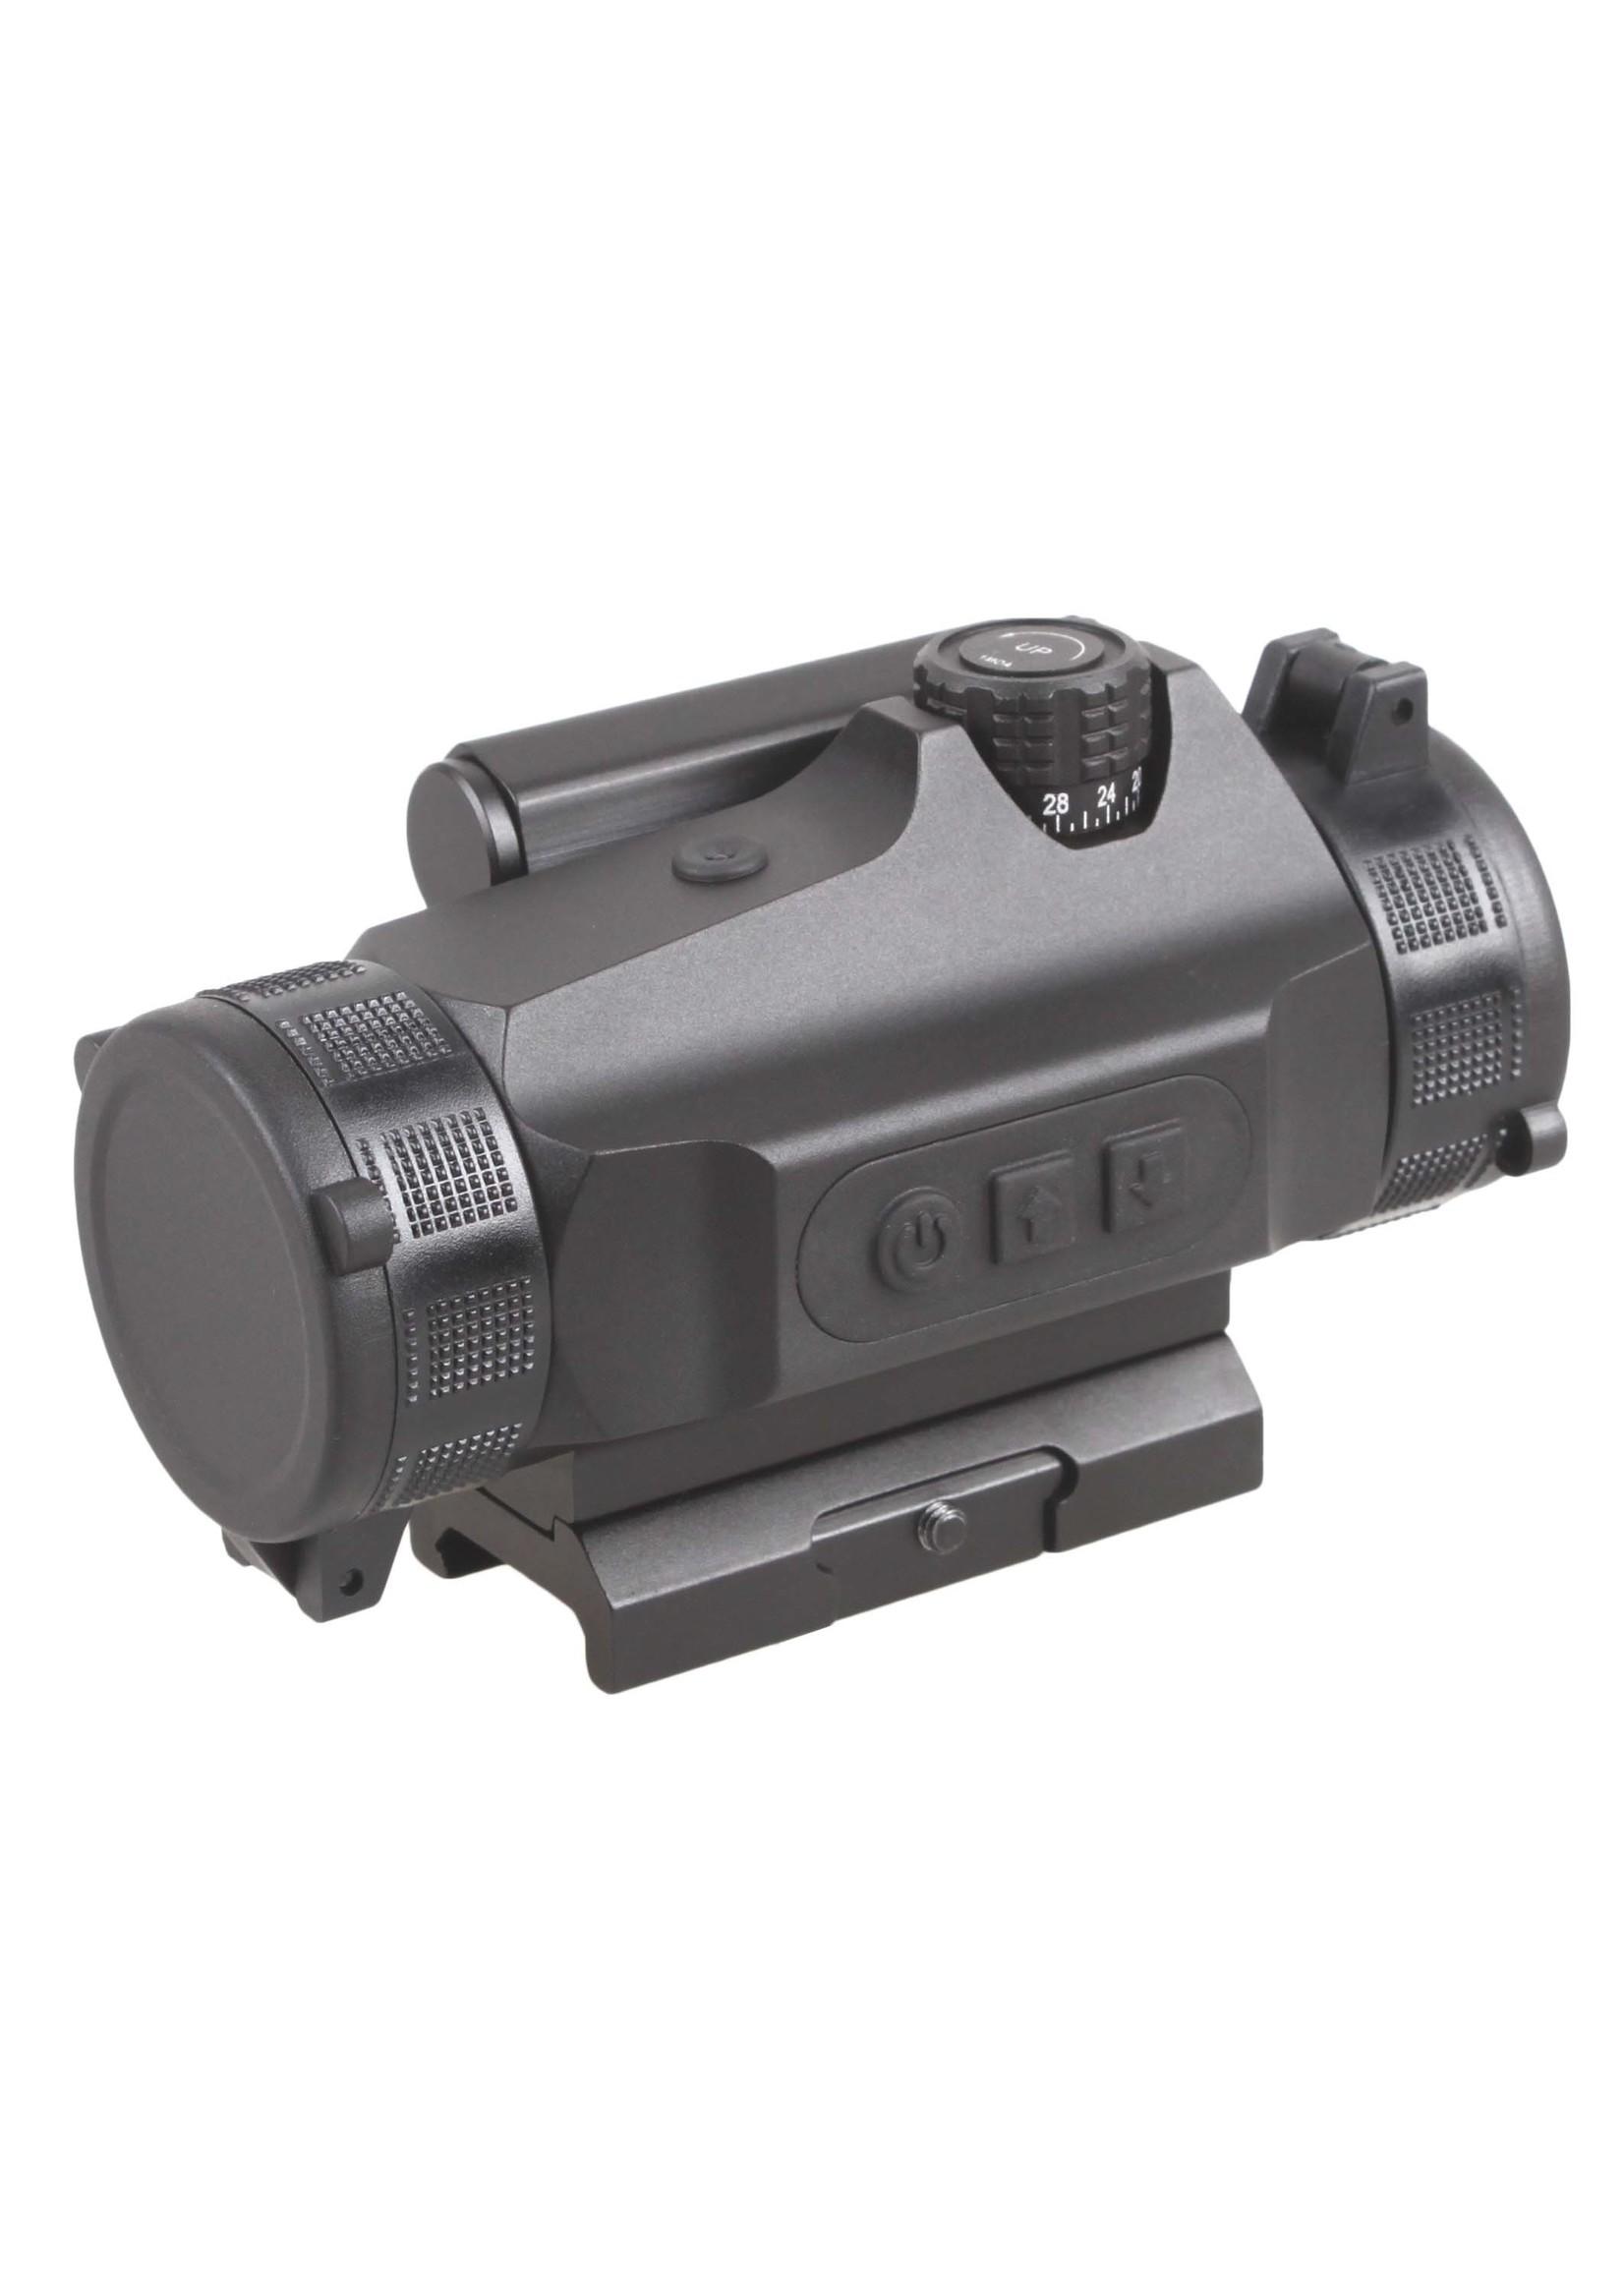 Vector Optics Vector Optics Nautilus 1x30 Red Dot Sight with Ambient Light Sensor Gen1 DQ Mount